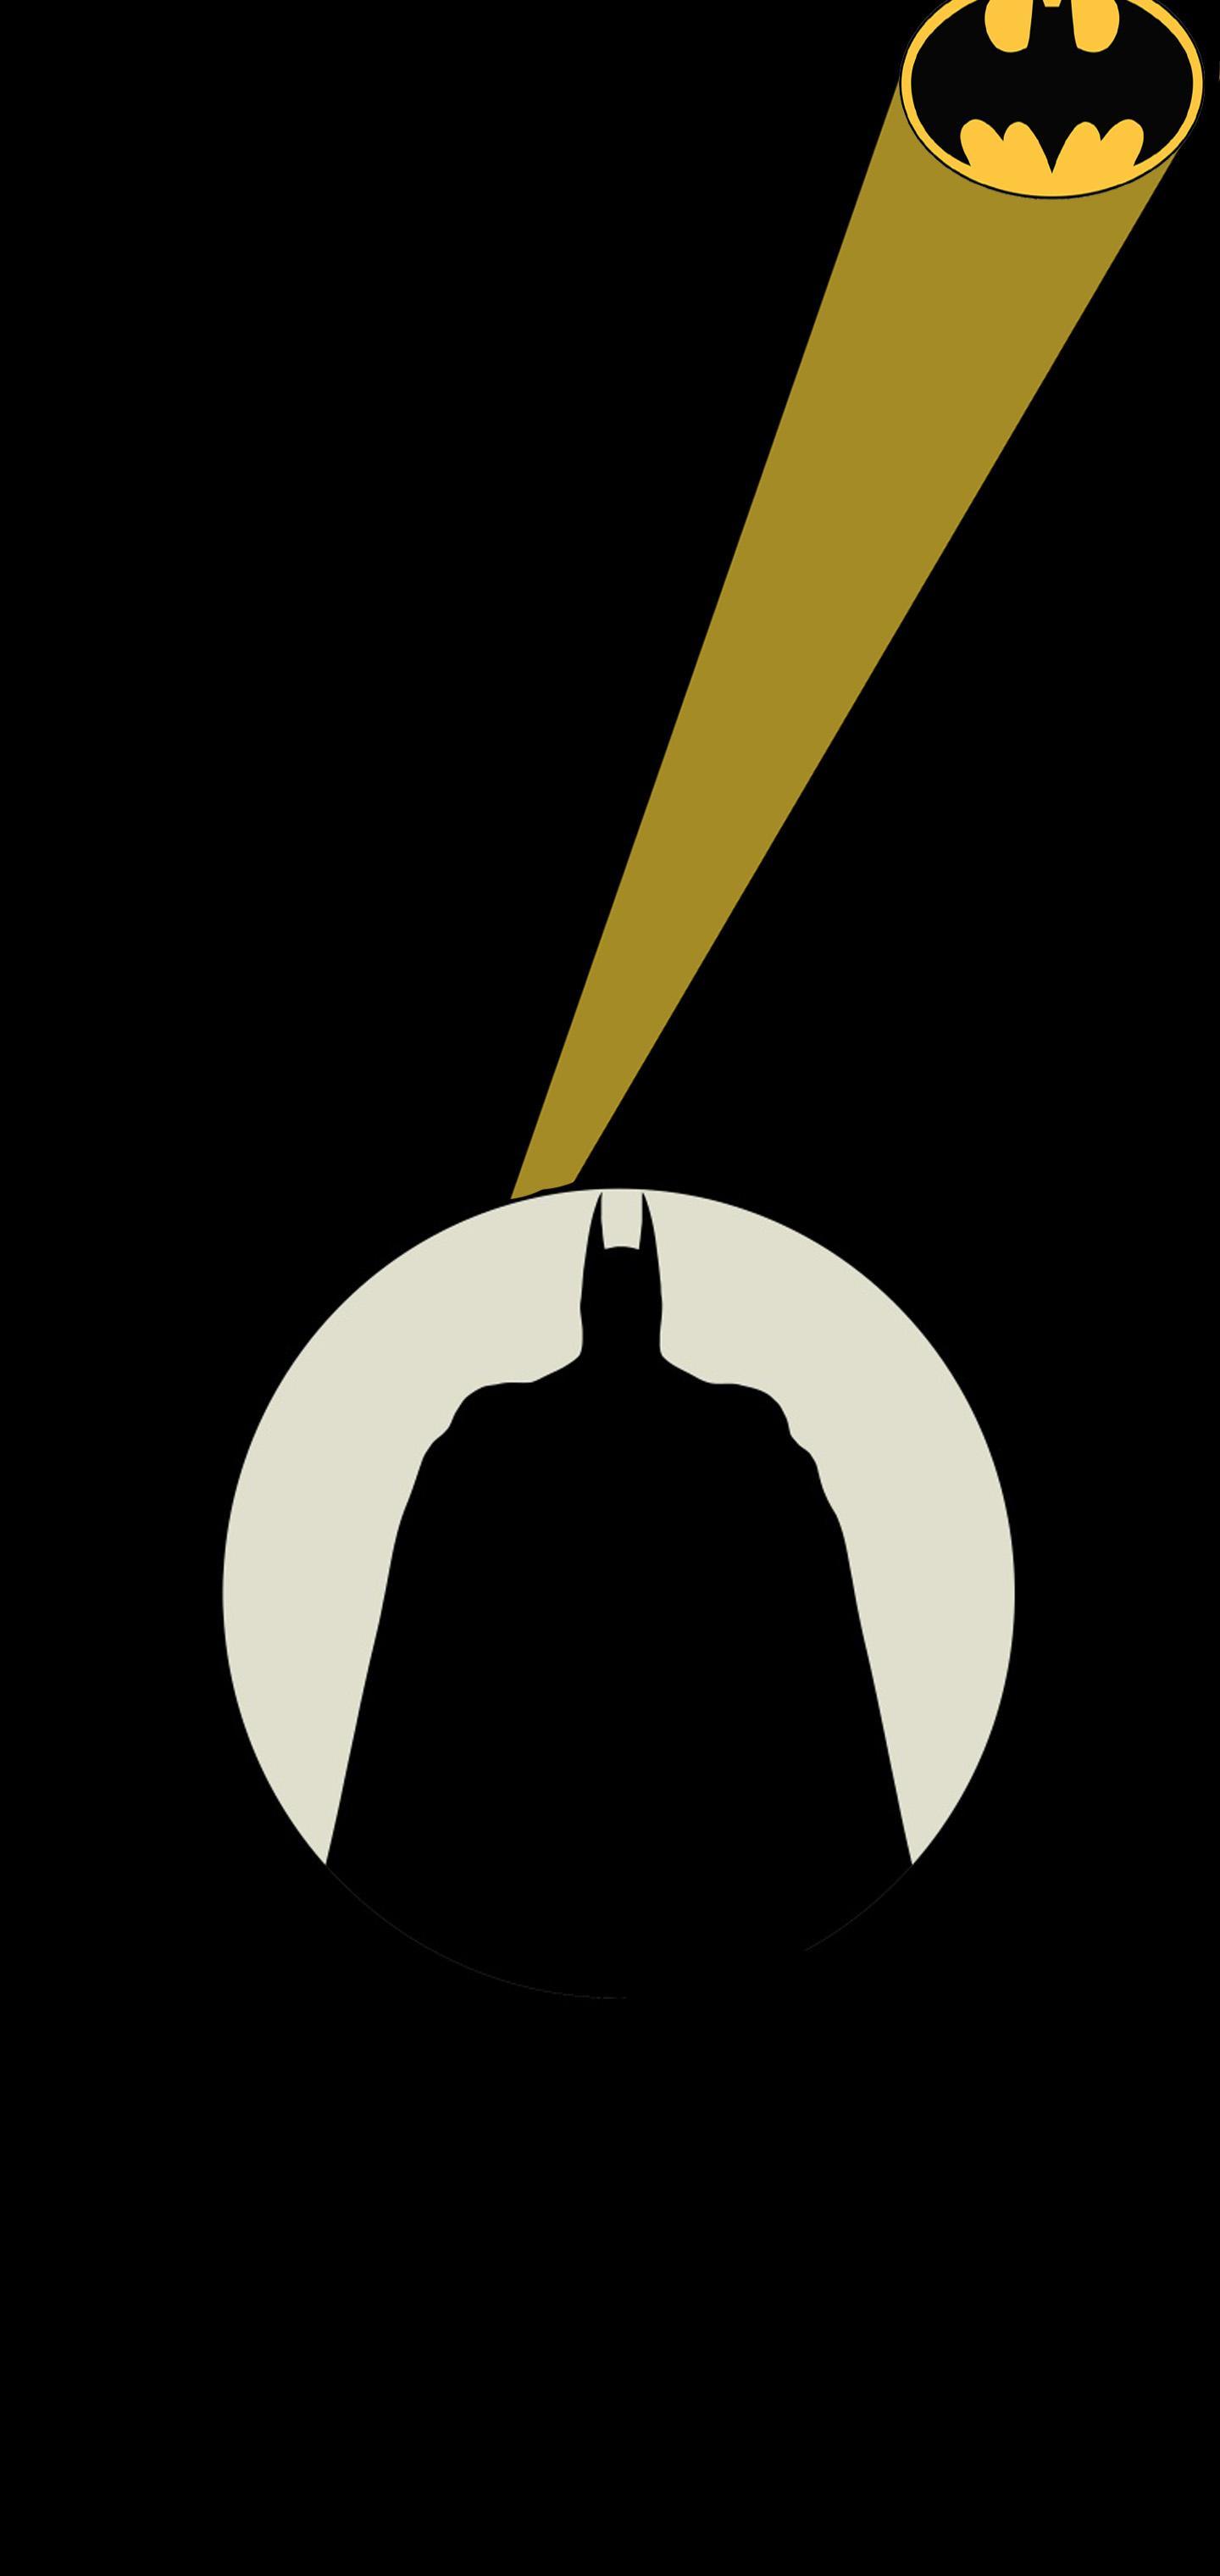 Batman Wallpaper For S10 Plus 2281928 Hd Wallpaper Backgrounds Download